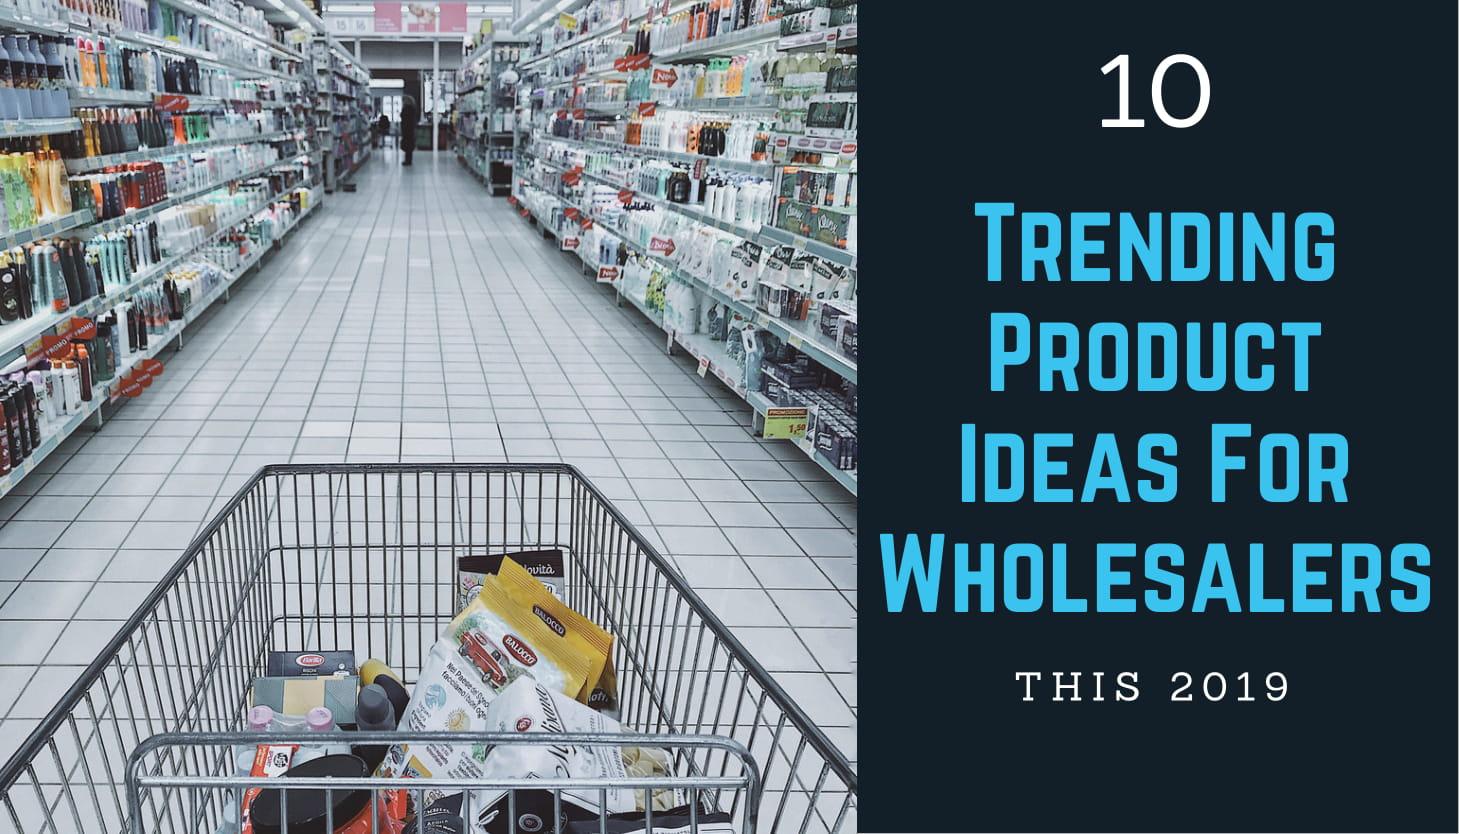 Trending Ideas for wholesalers